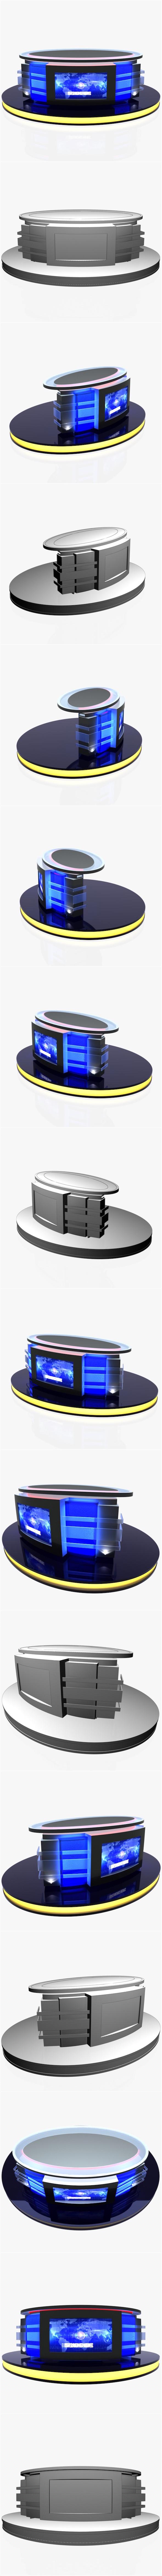 Virtual Tv Studio News Desk 12 - 3DOcean Item for Sale